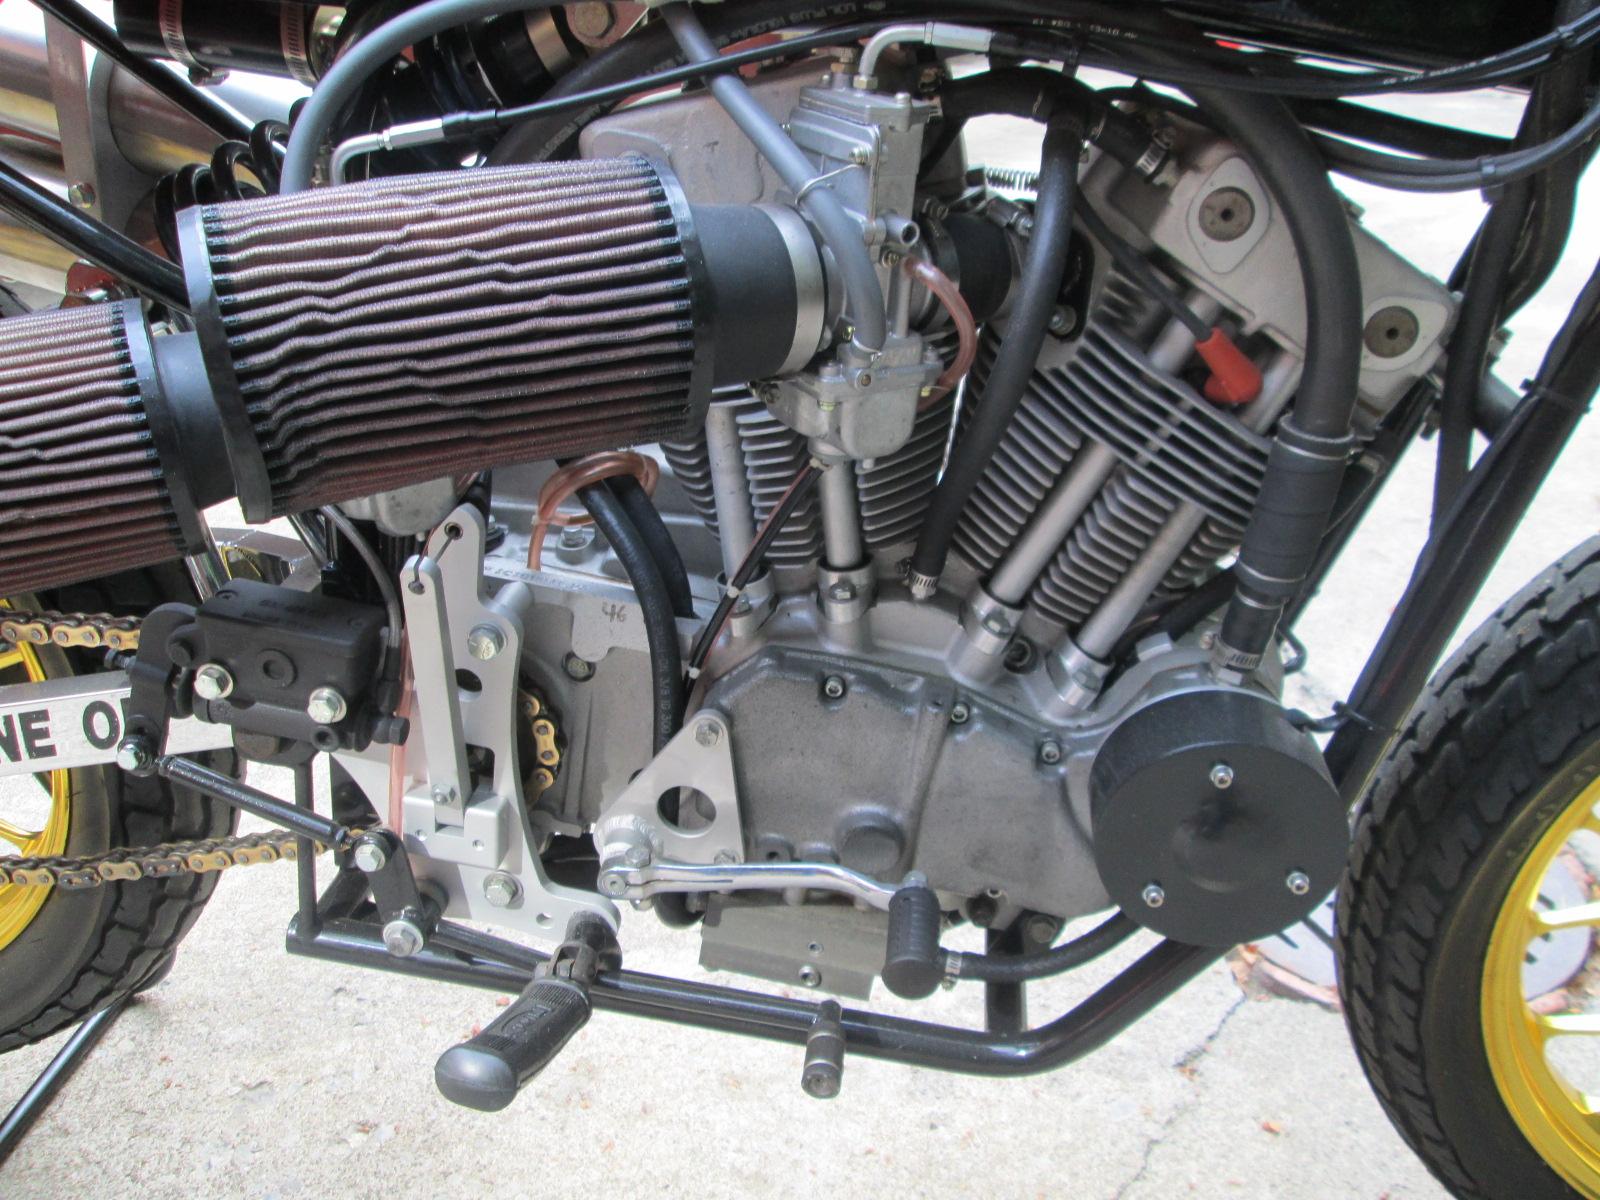 XR750 Pic 7